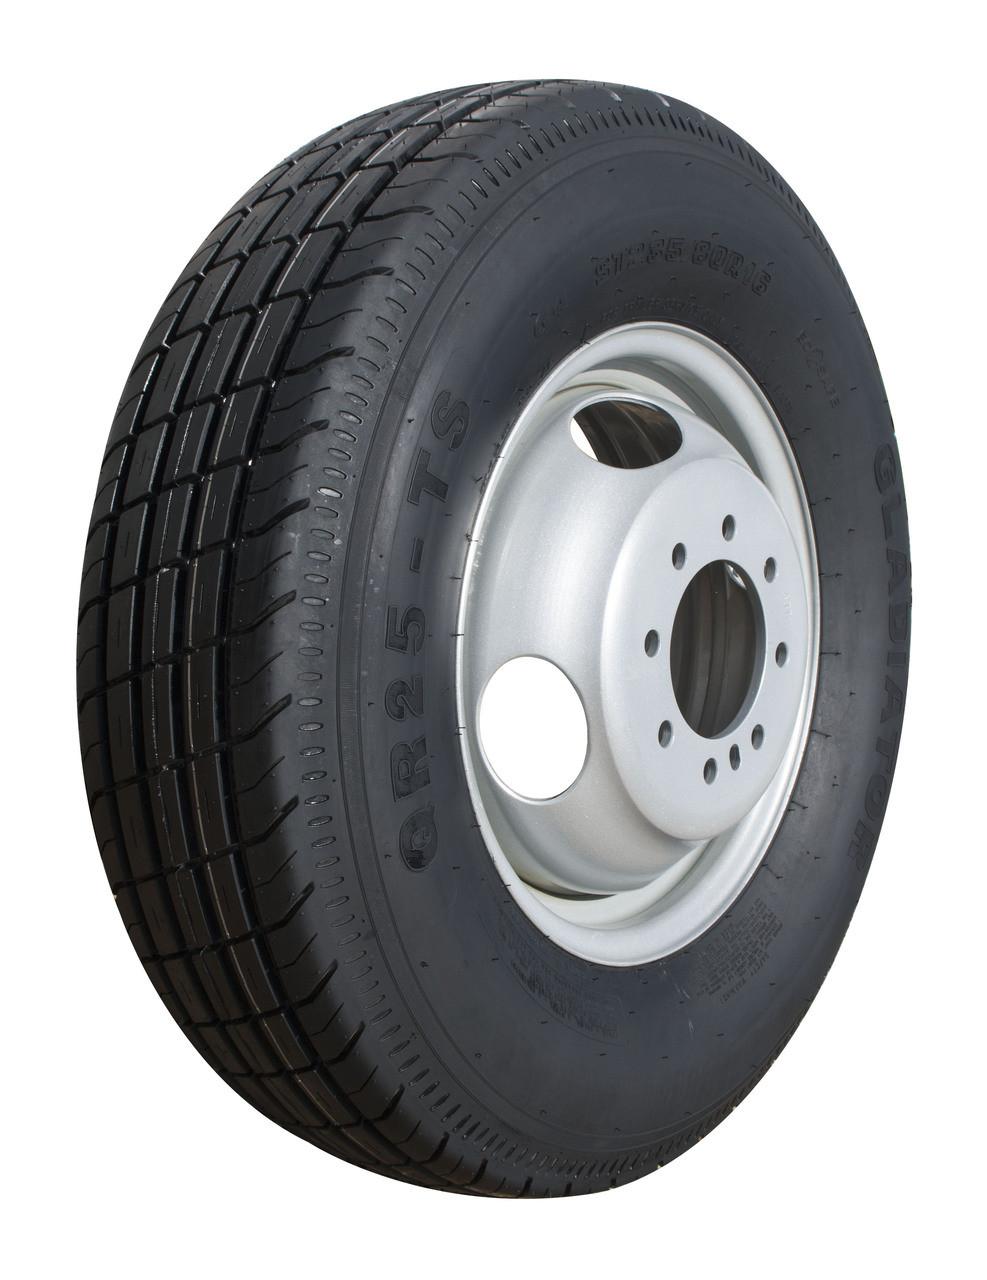 Tire Assy 235/80 R-16 Radial w/16 x 6 865 Dual S Offset 5 PILOT DIA. 4.77